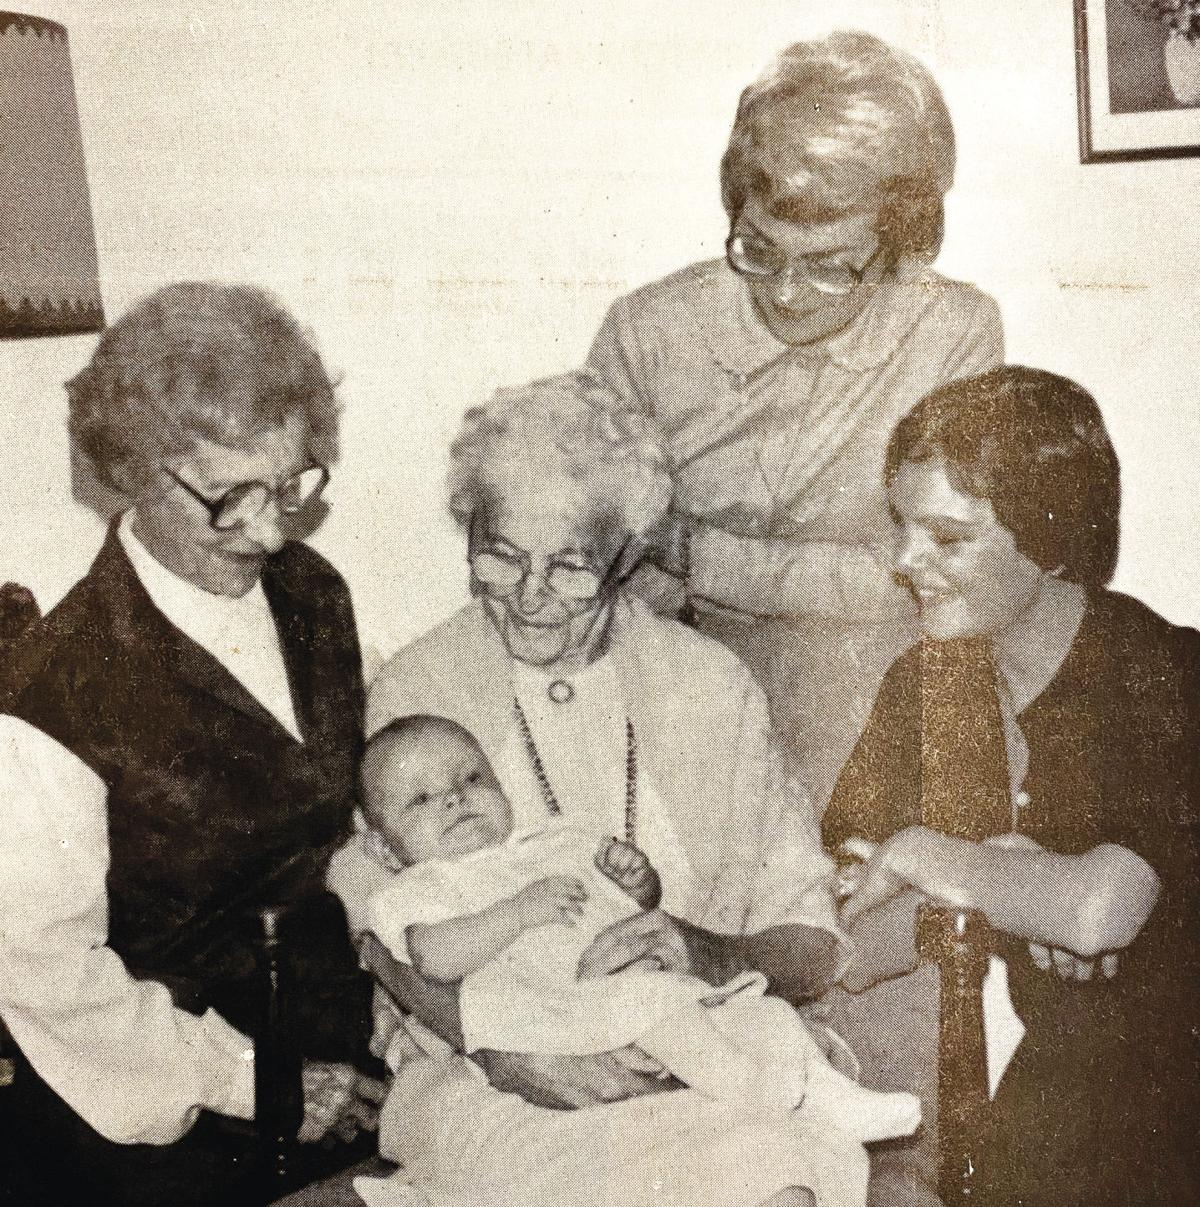 Jan. 9, 1980 — Generations Recorded